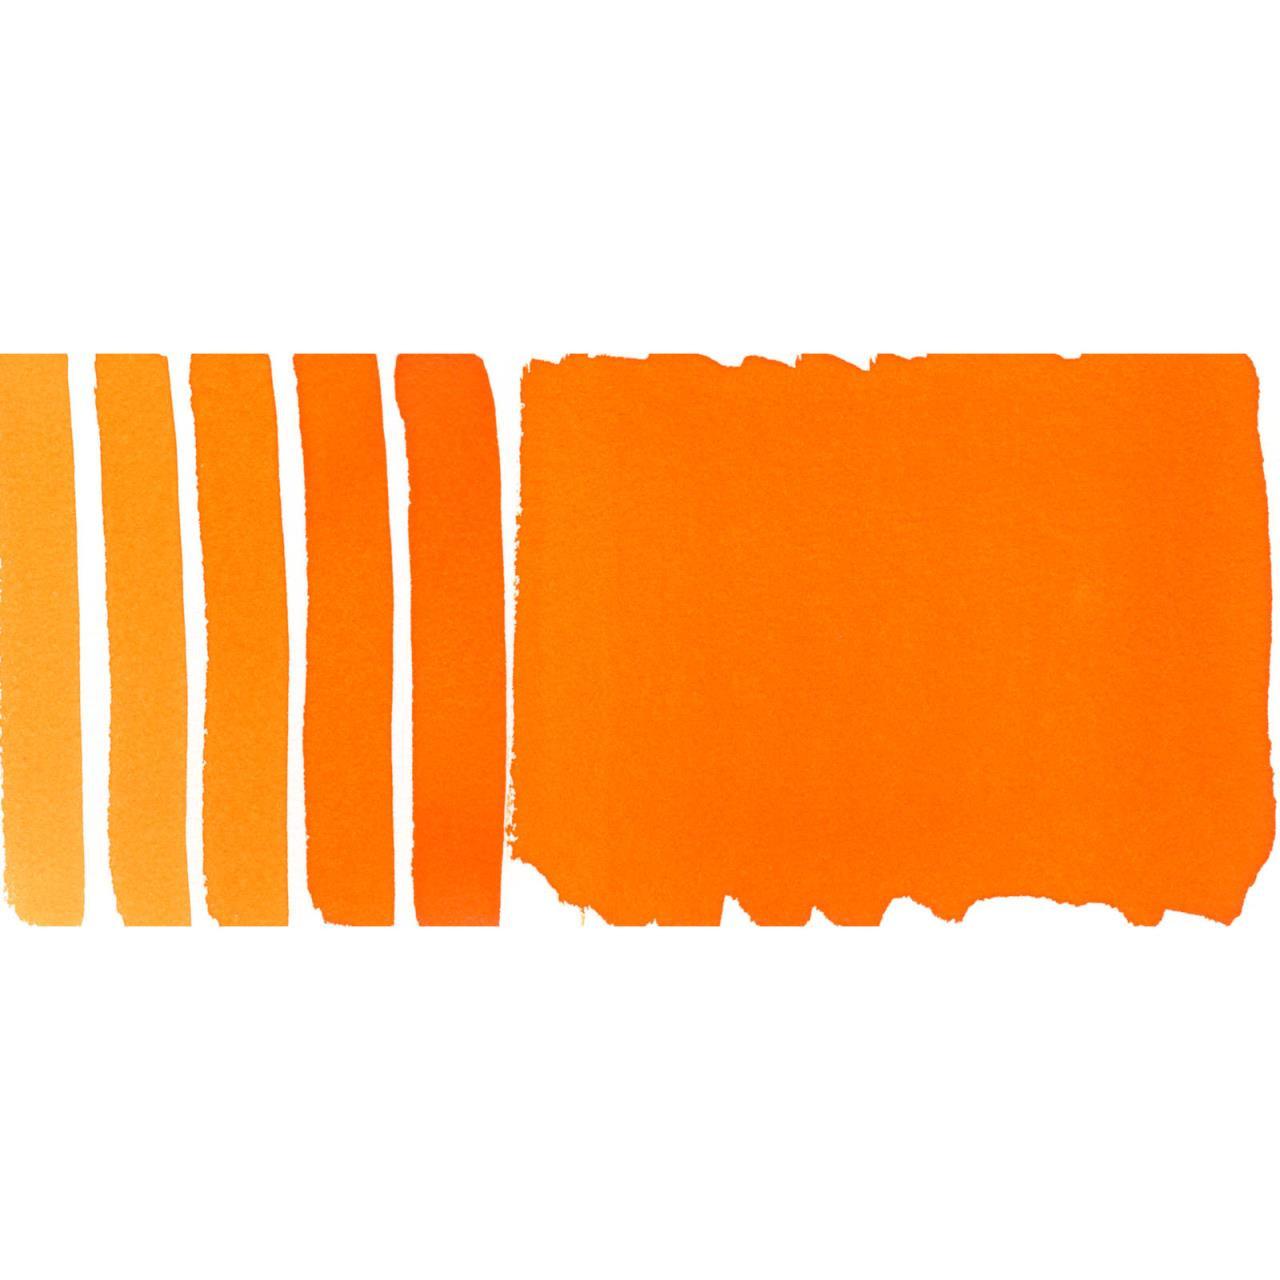 Permanent Orange, DANIEL SMITH Extra Fine Watercolors 15ml Tubes -